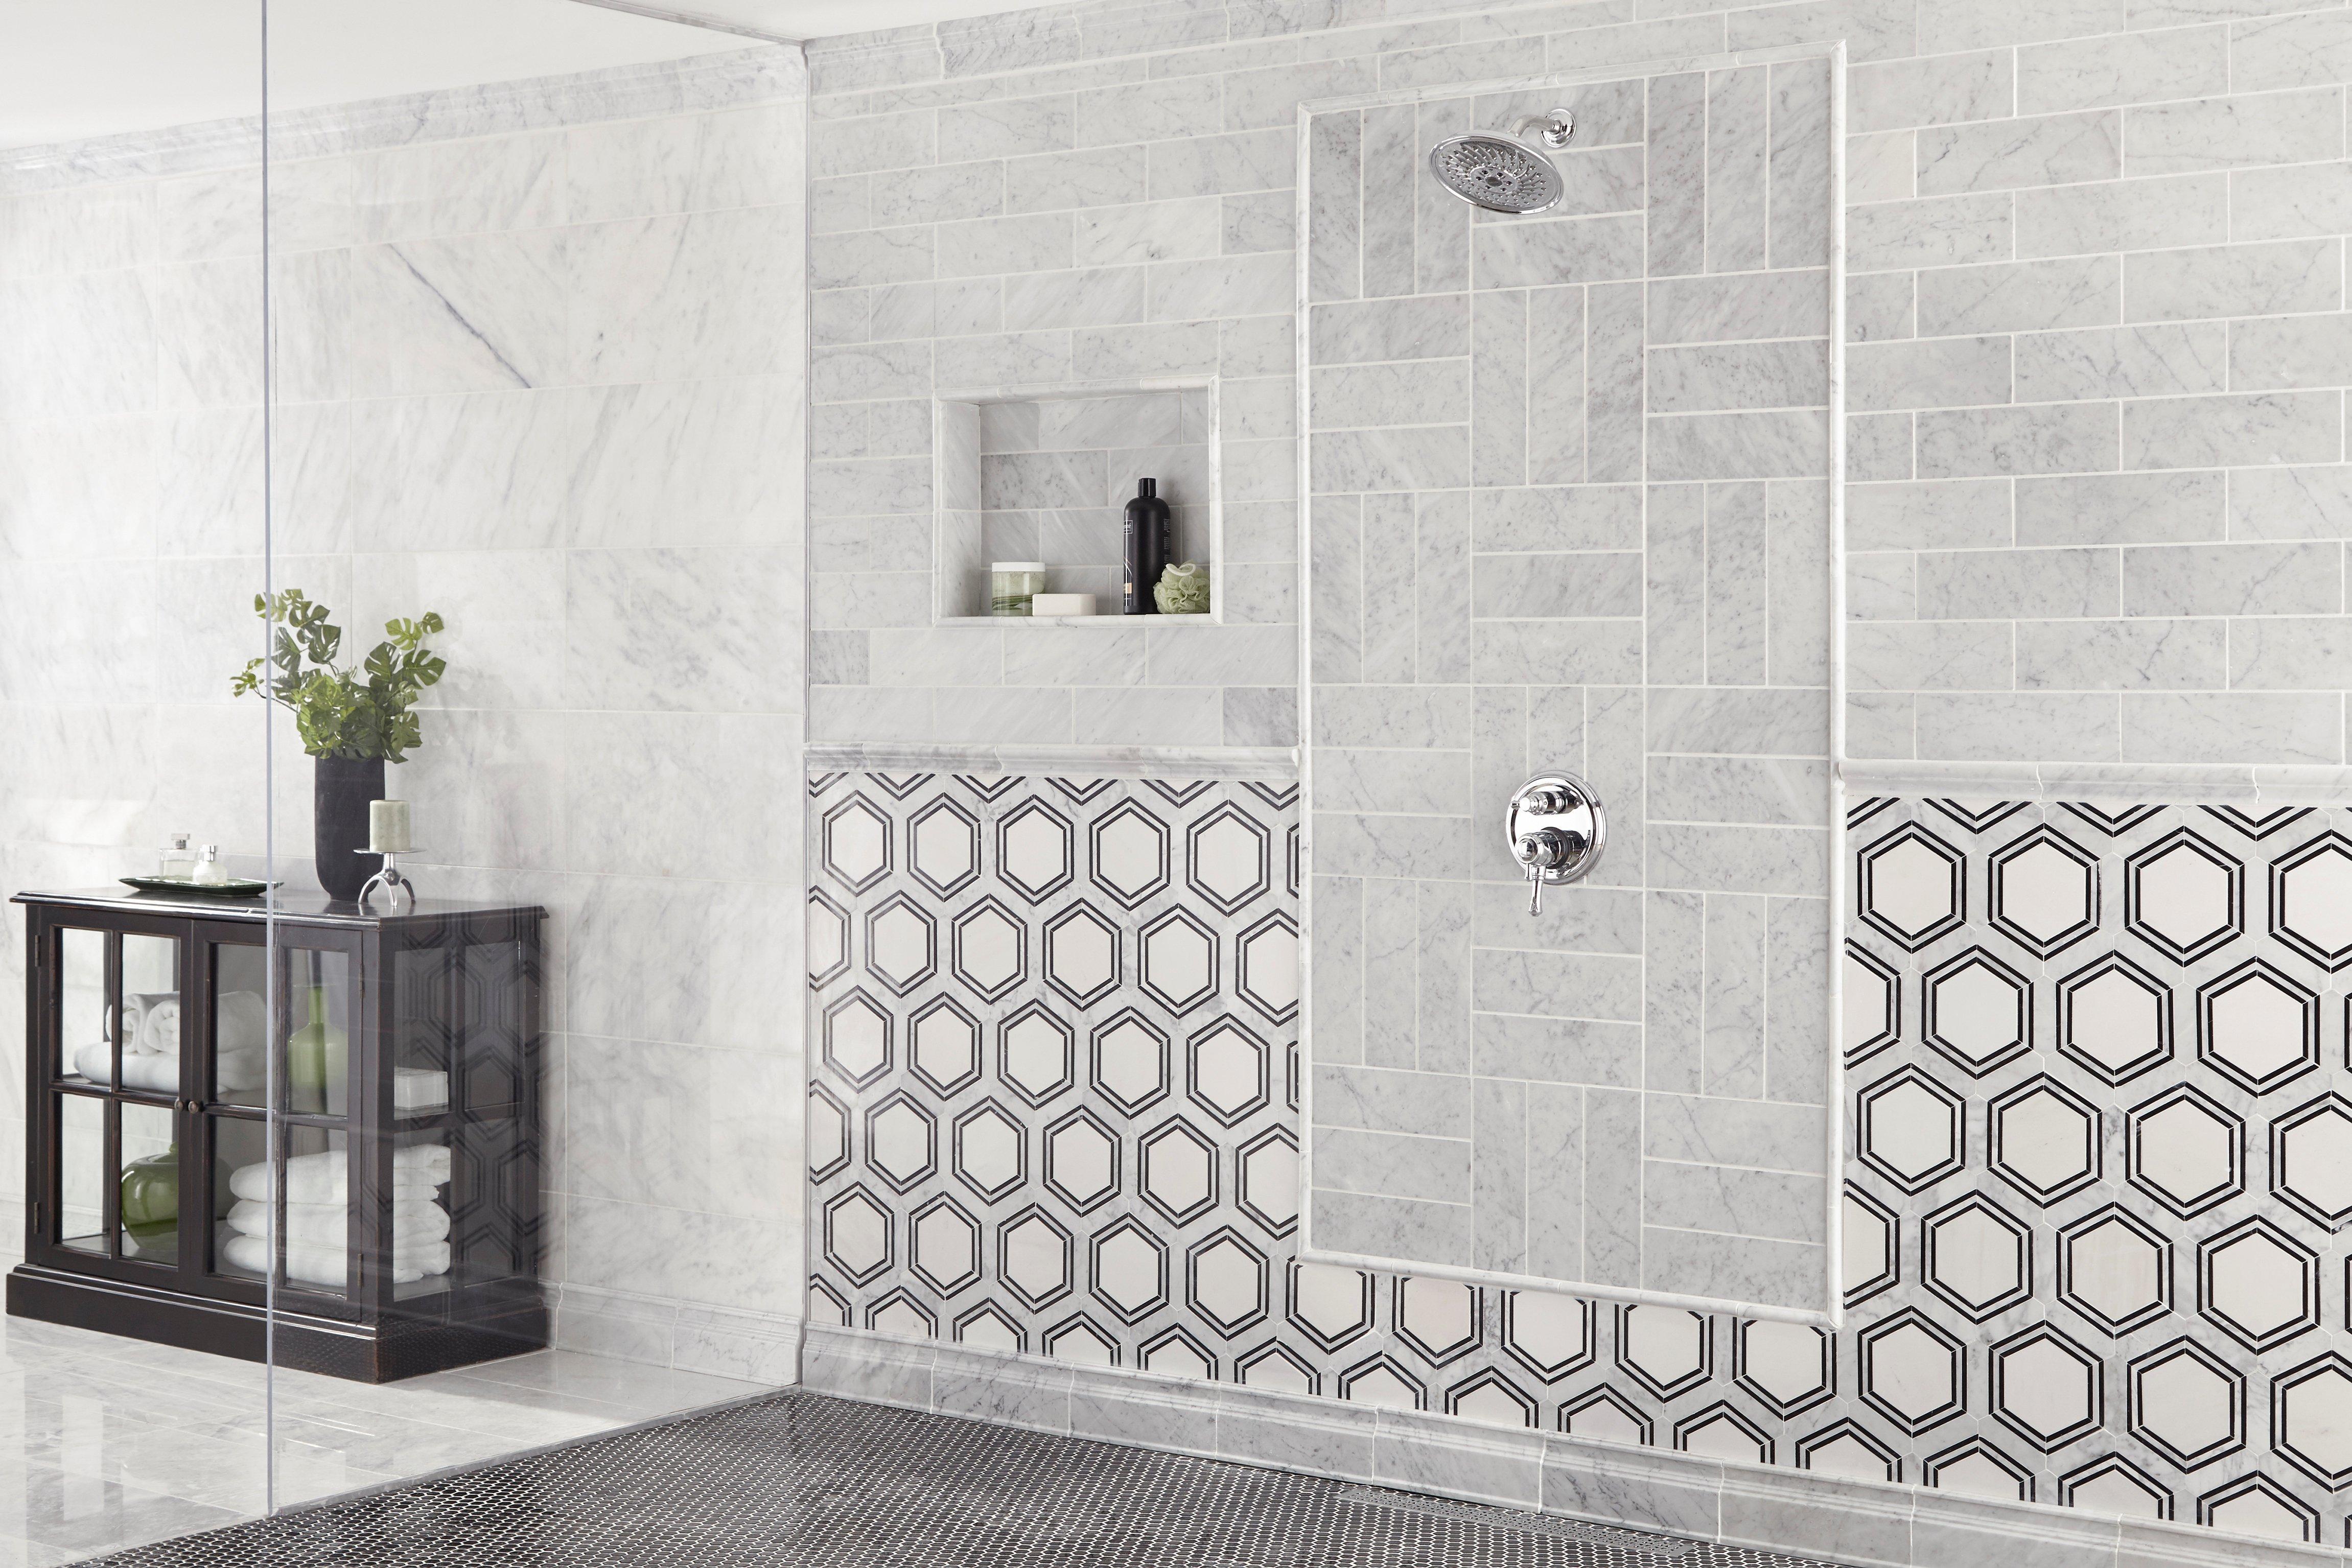 Bath Showers For Sale - Cintinel.com